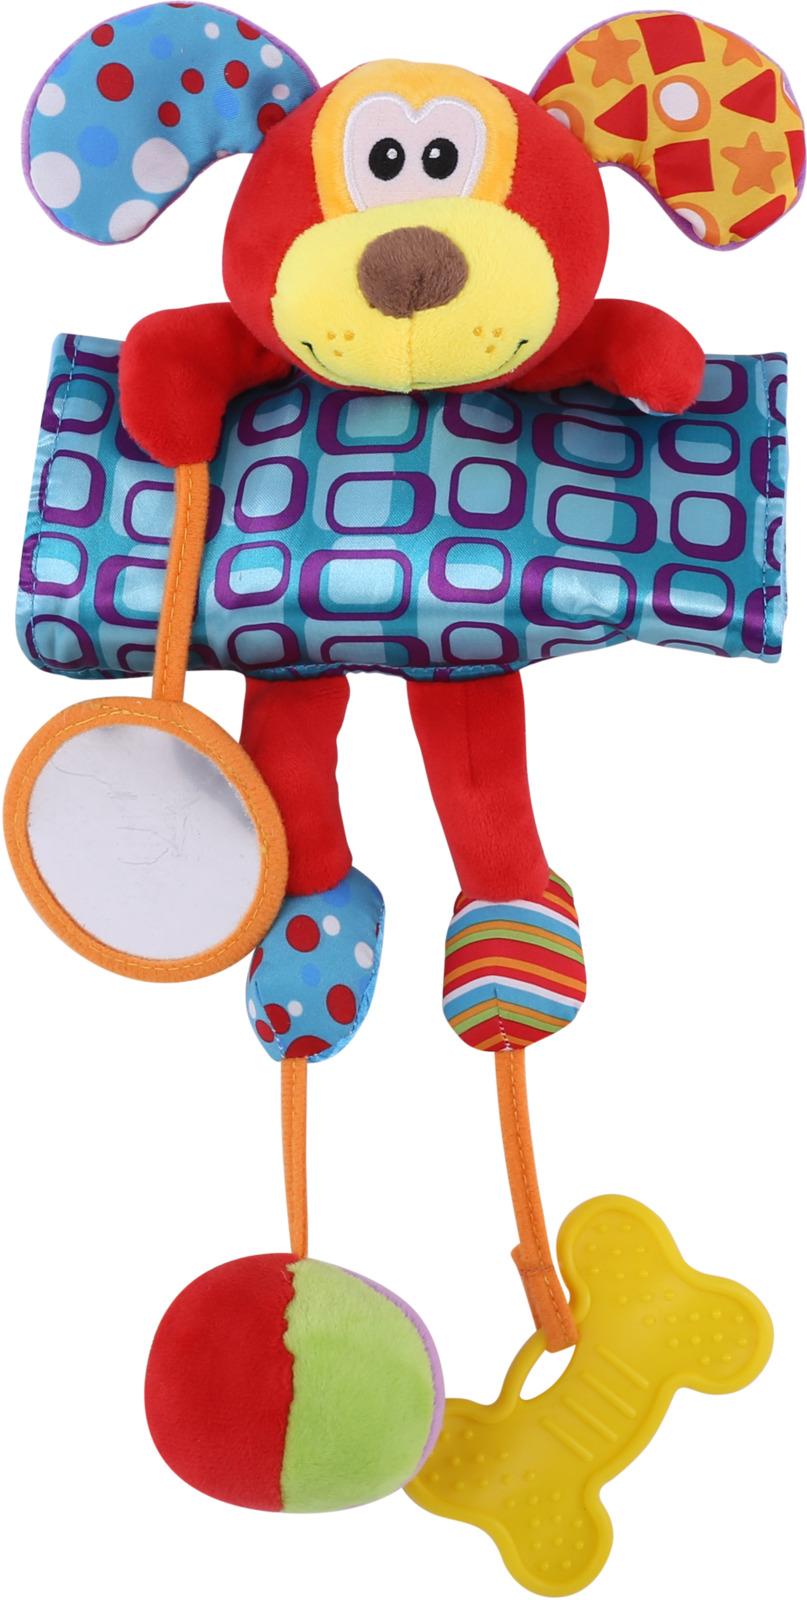 Развивающая игрушка Lorelli Toys Обними меня. Собачка. 10191260002 развивающая игрушка lorelli toys обними меня мартышка 10191260001